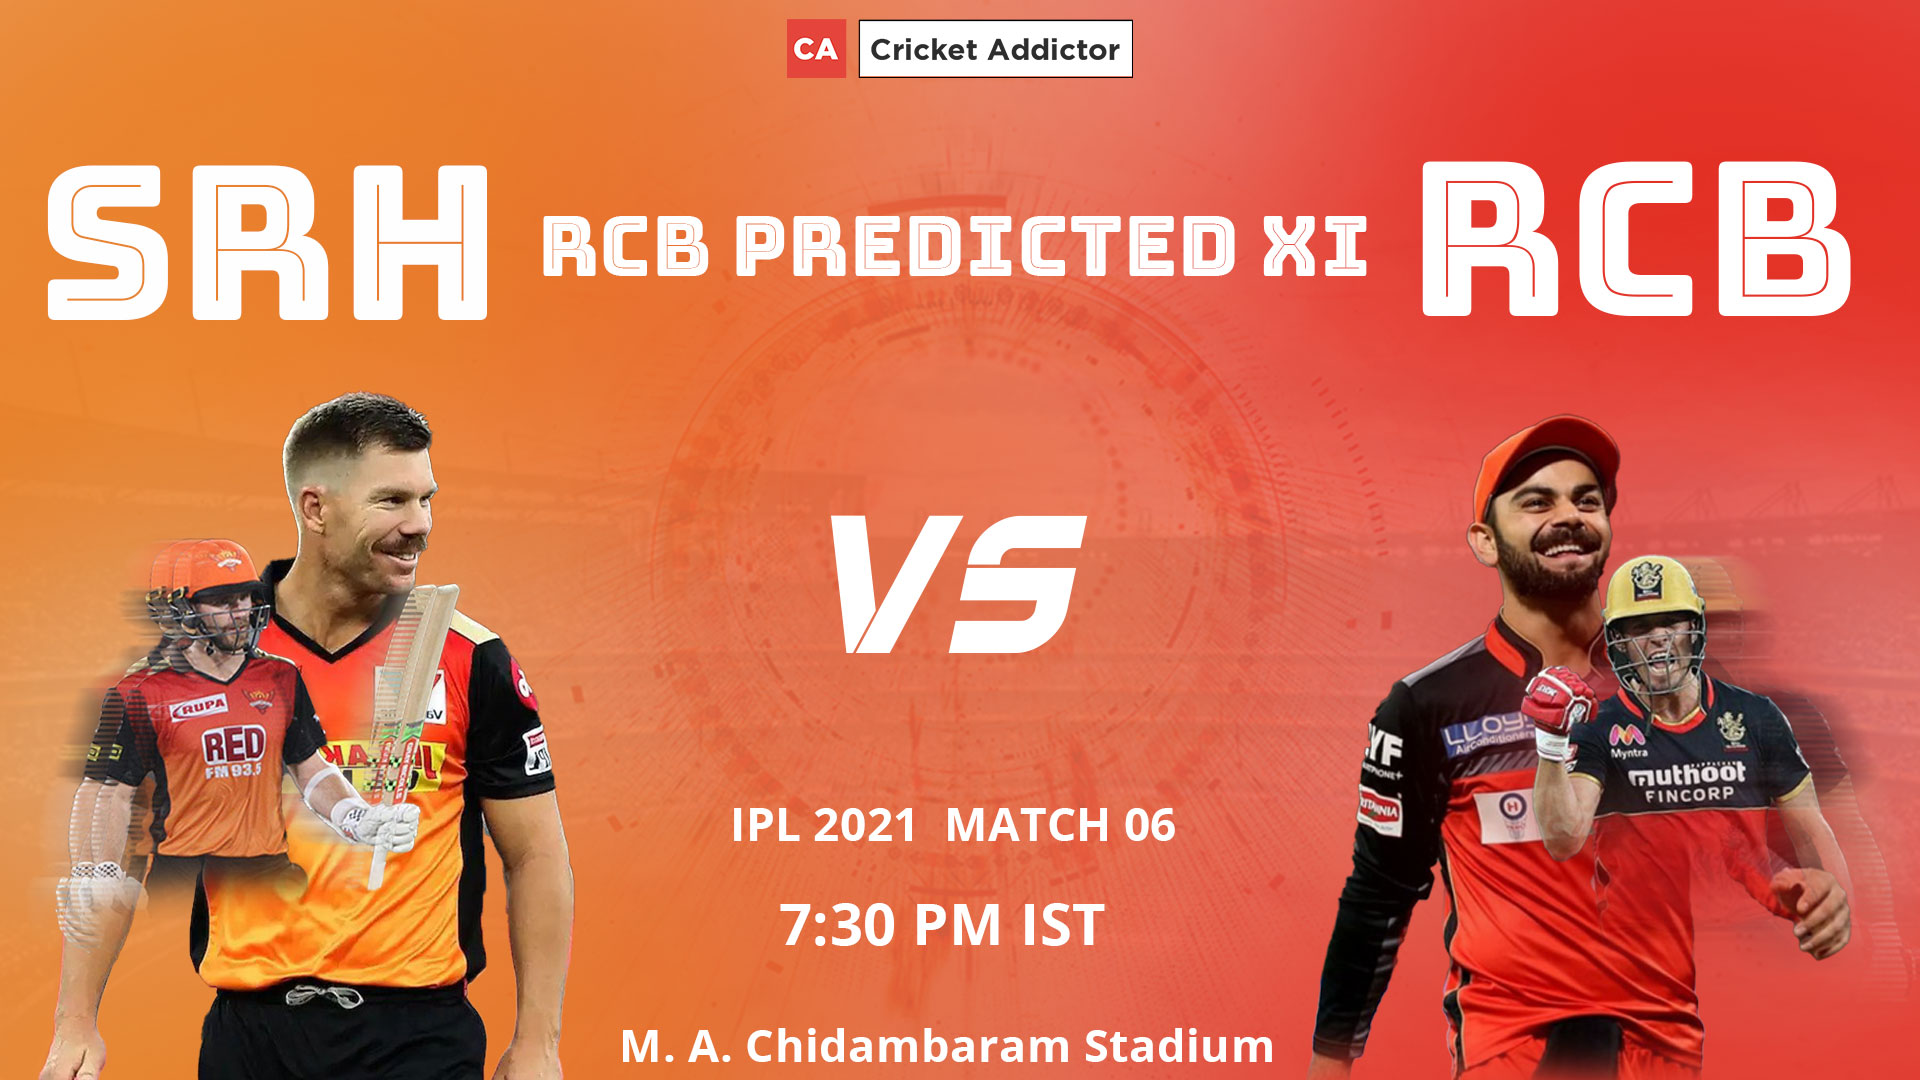 IPL 2021, RCB, Royal Challengers Bangalore, predicted playing XI